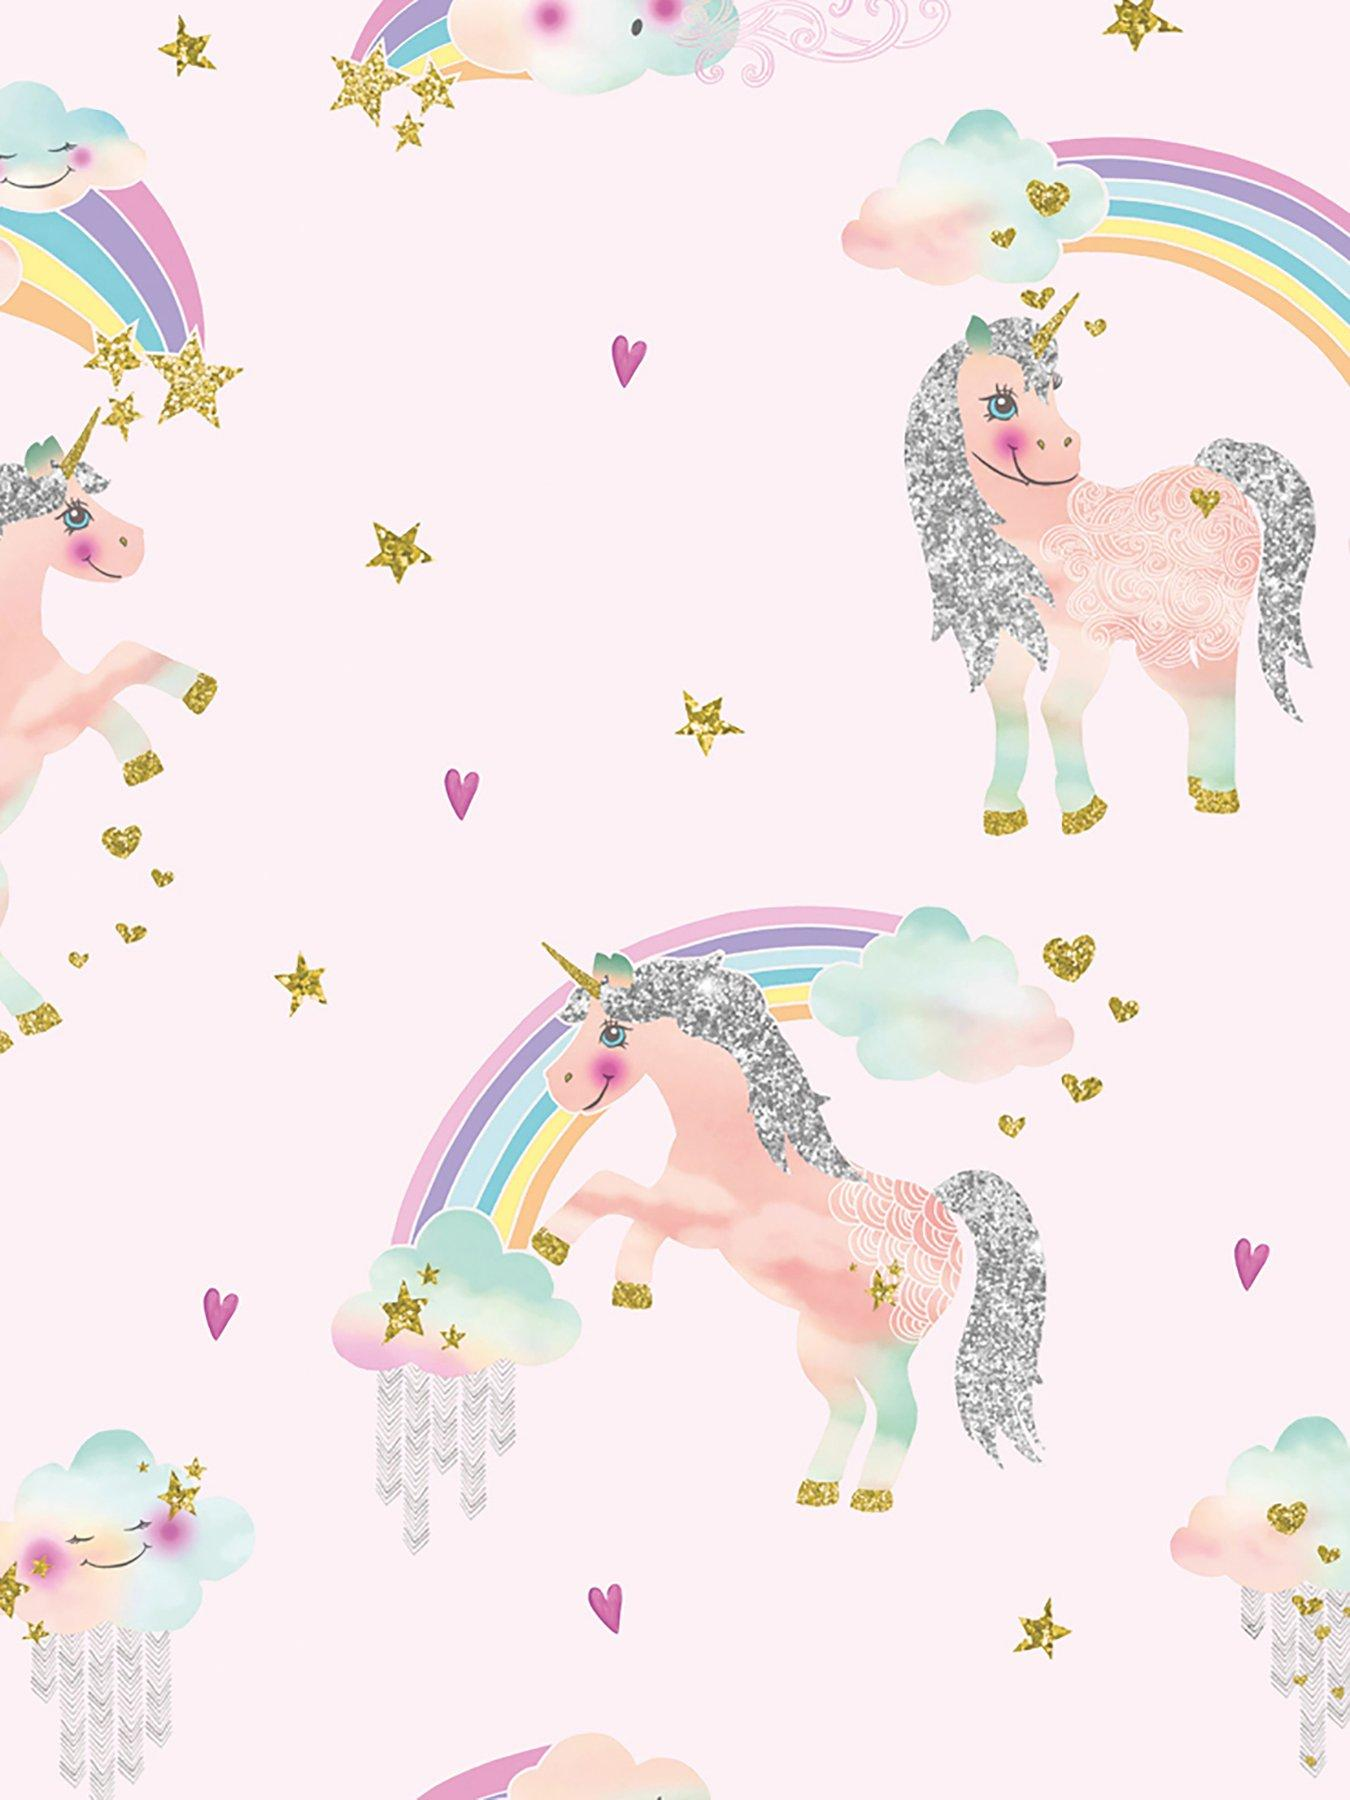 Unduh 9000 Wallpaper Hp Unicorn Gratis